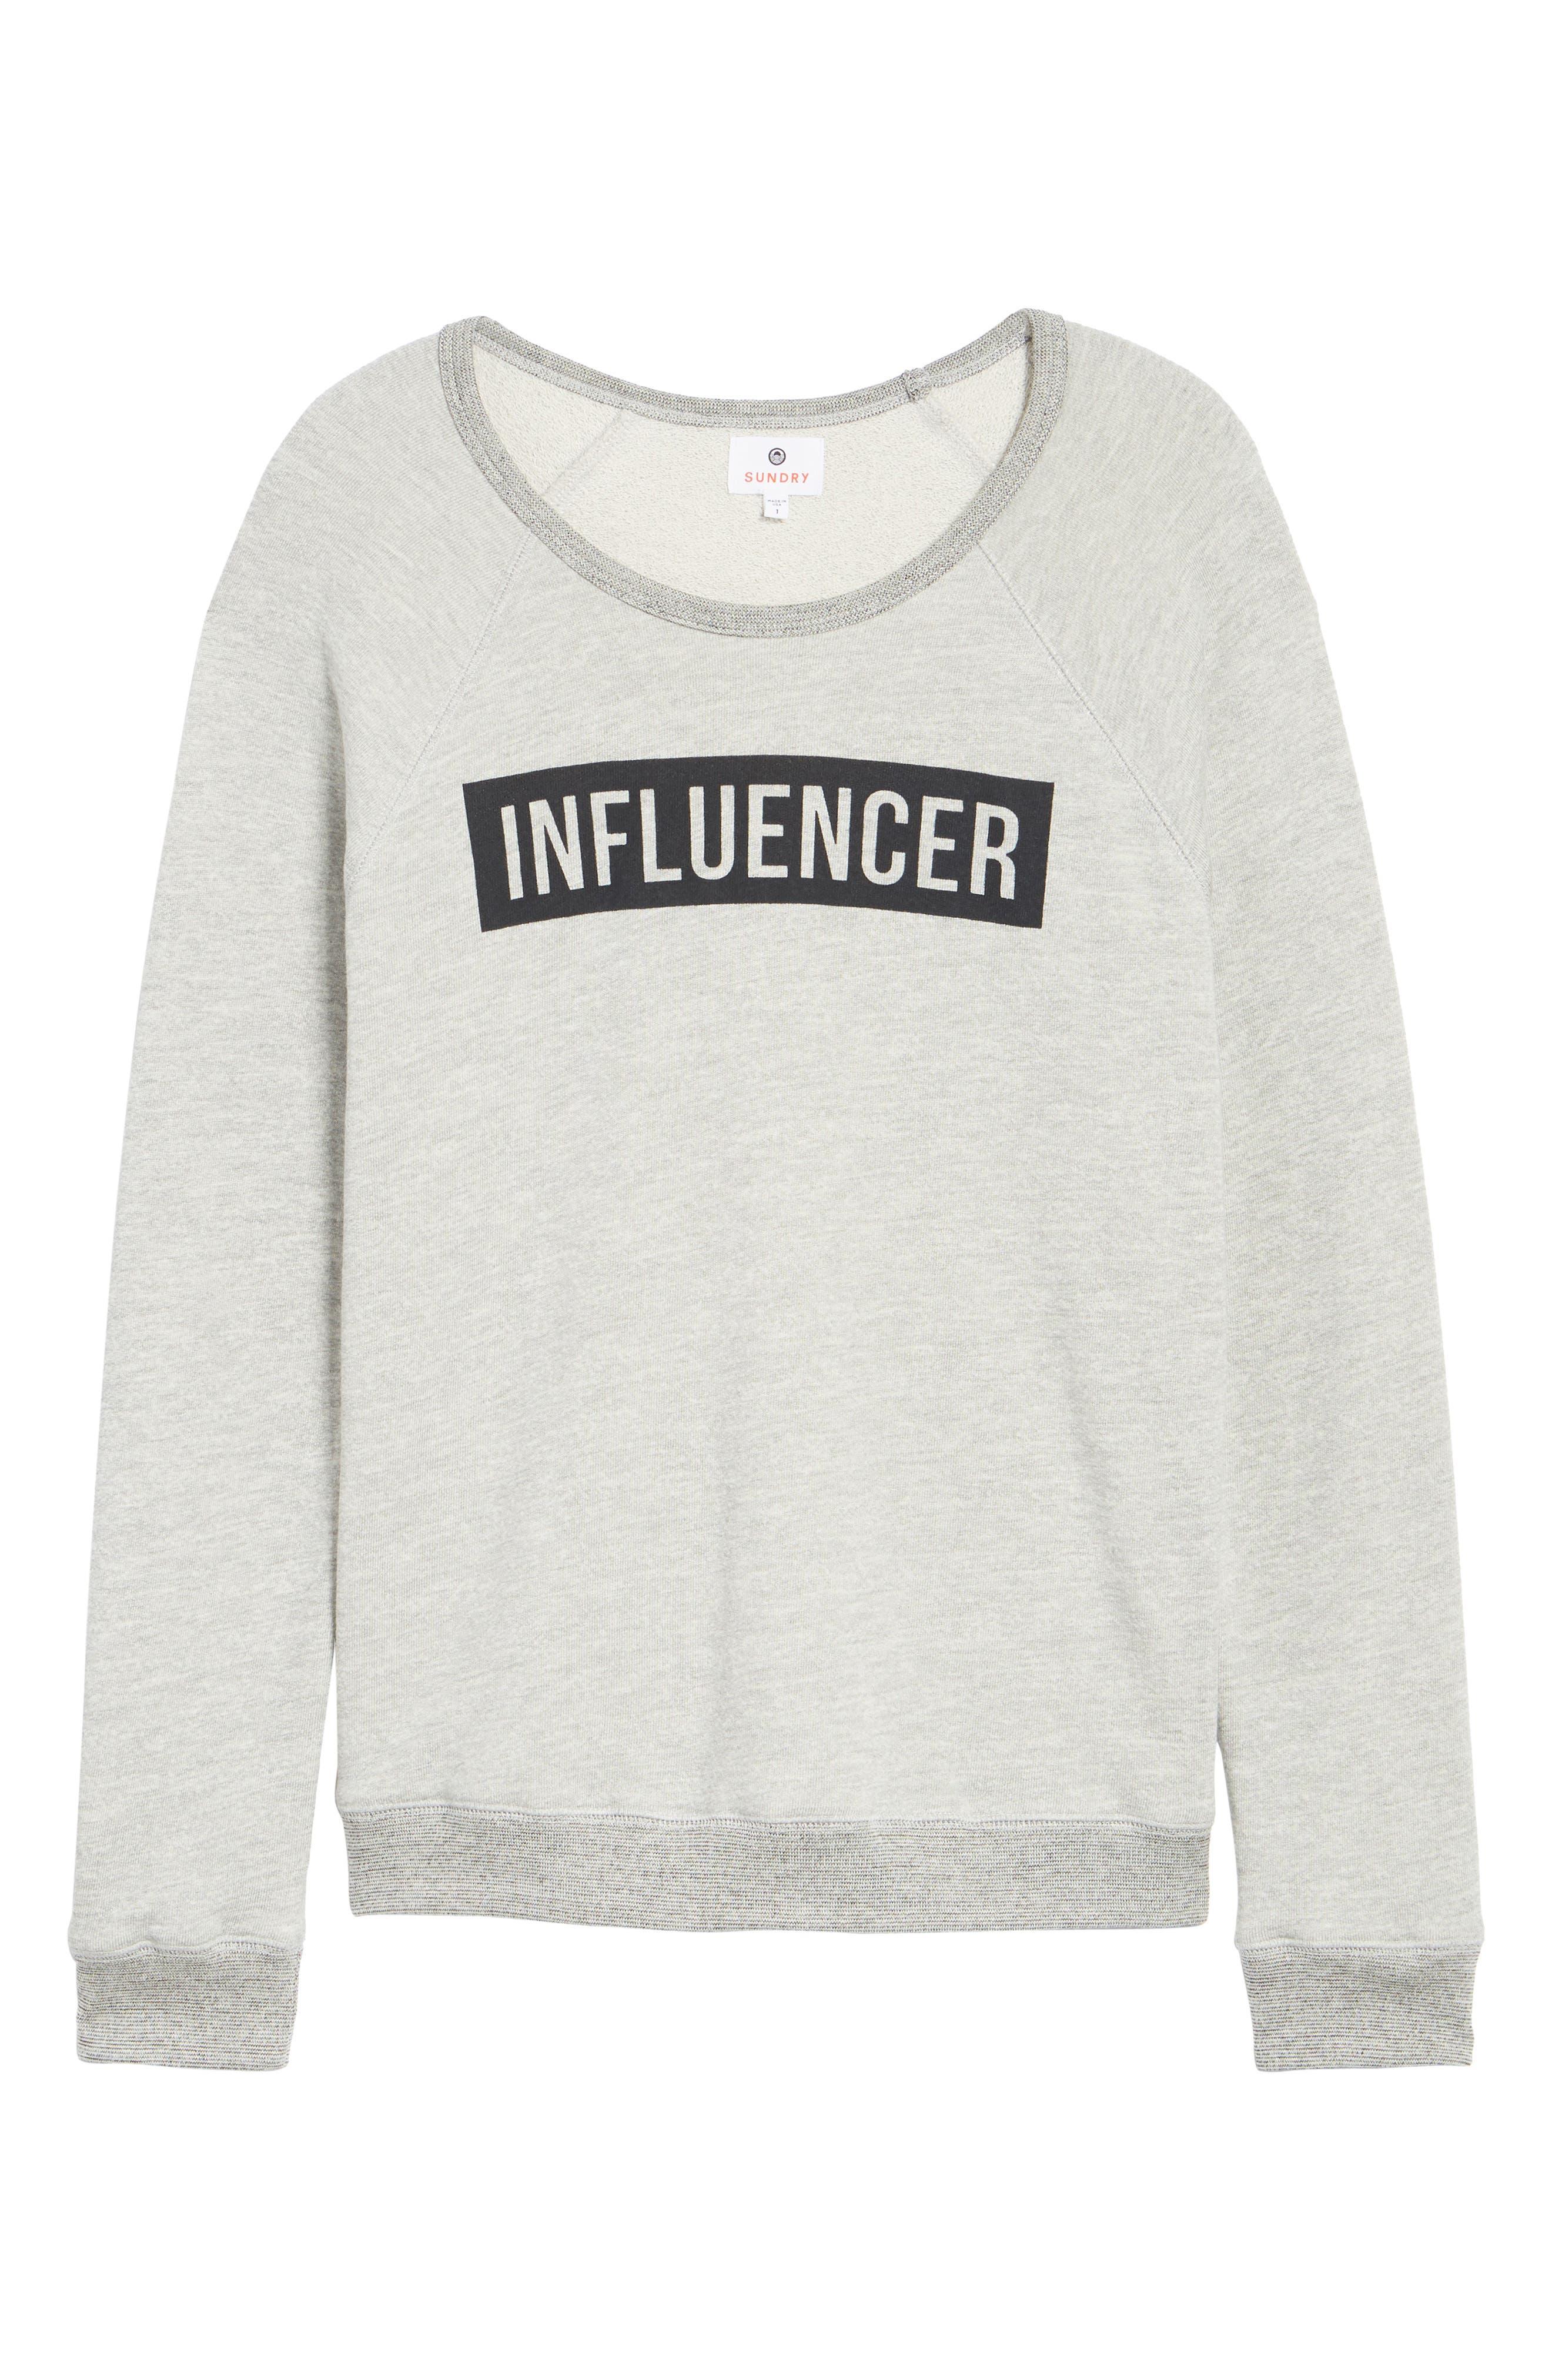 Influencer Sweatshirt,                             Alternate thumbnail 7, color,                             039